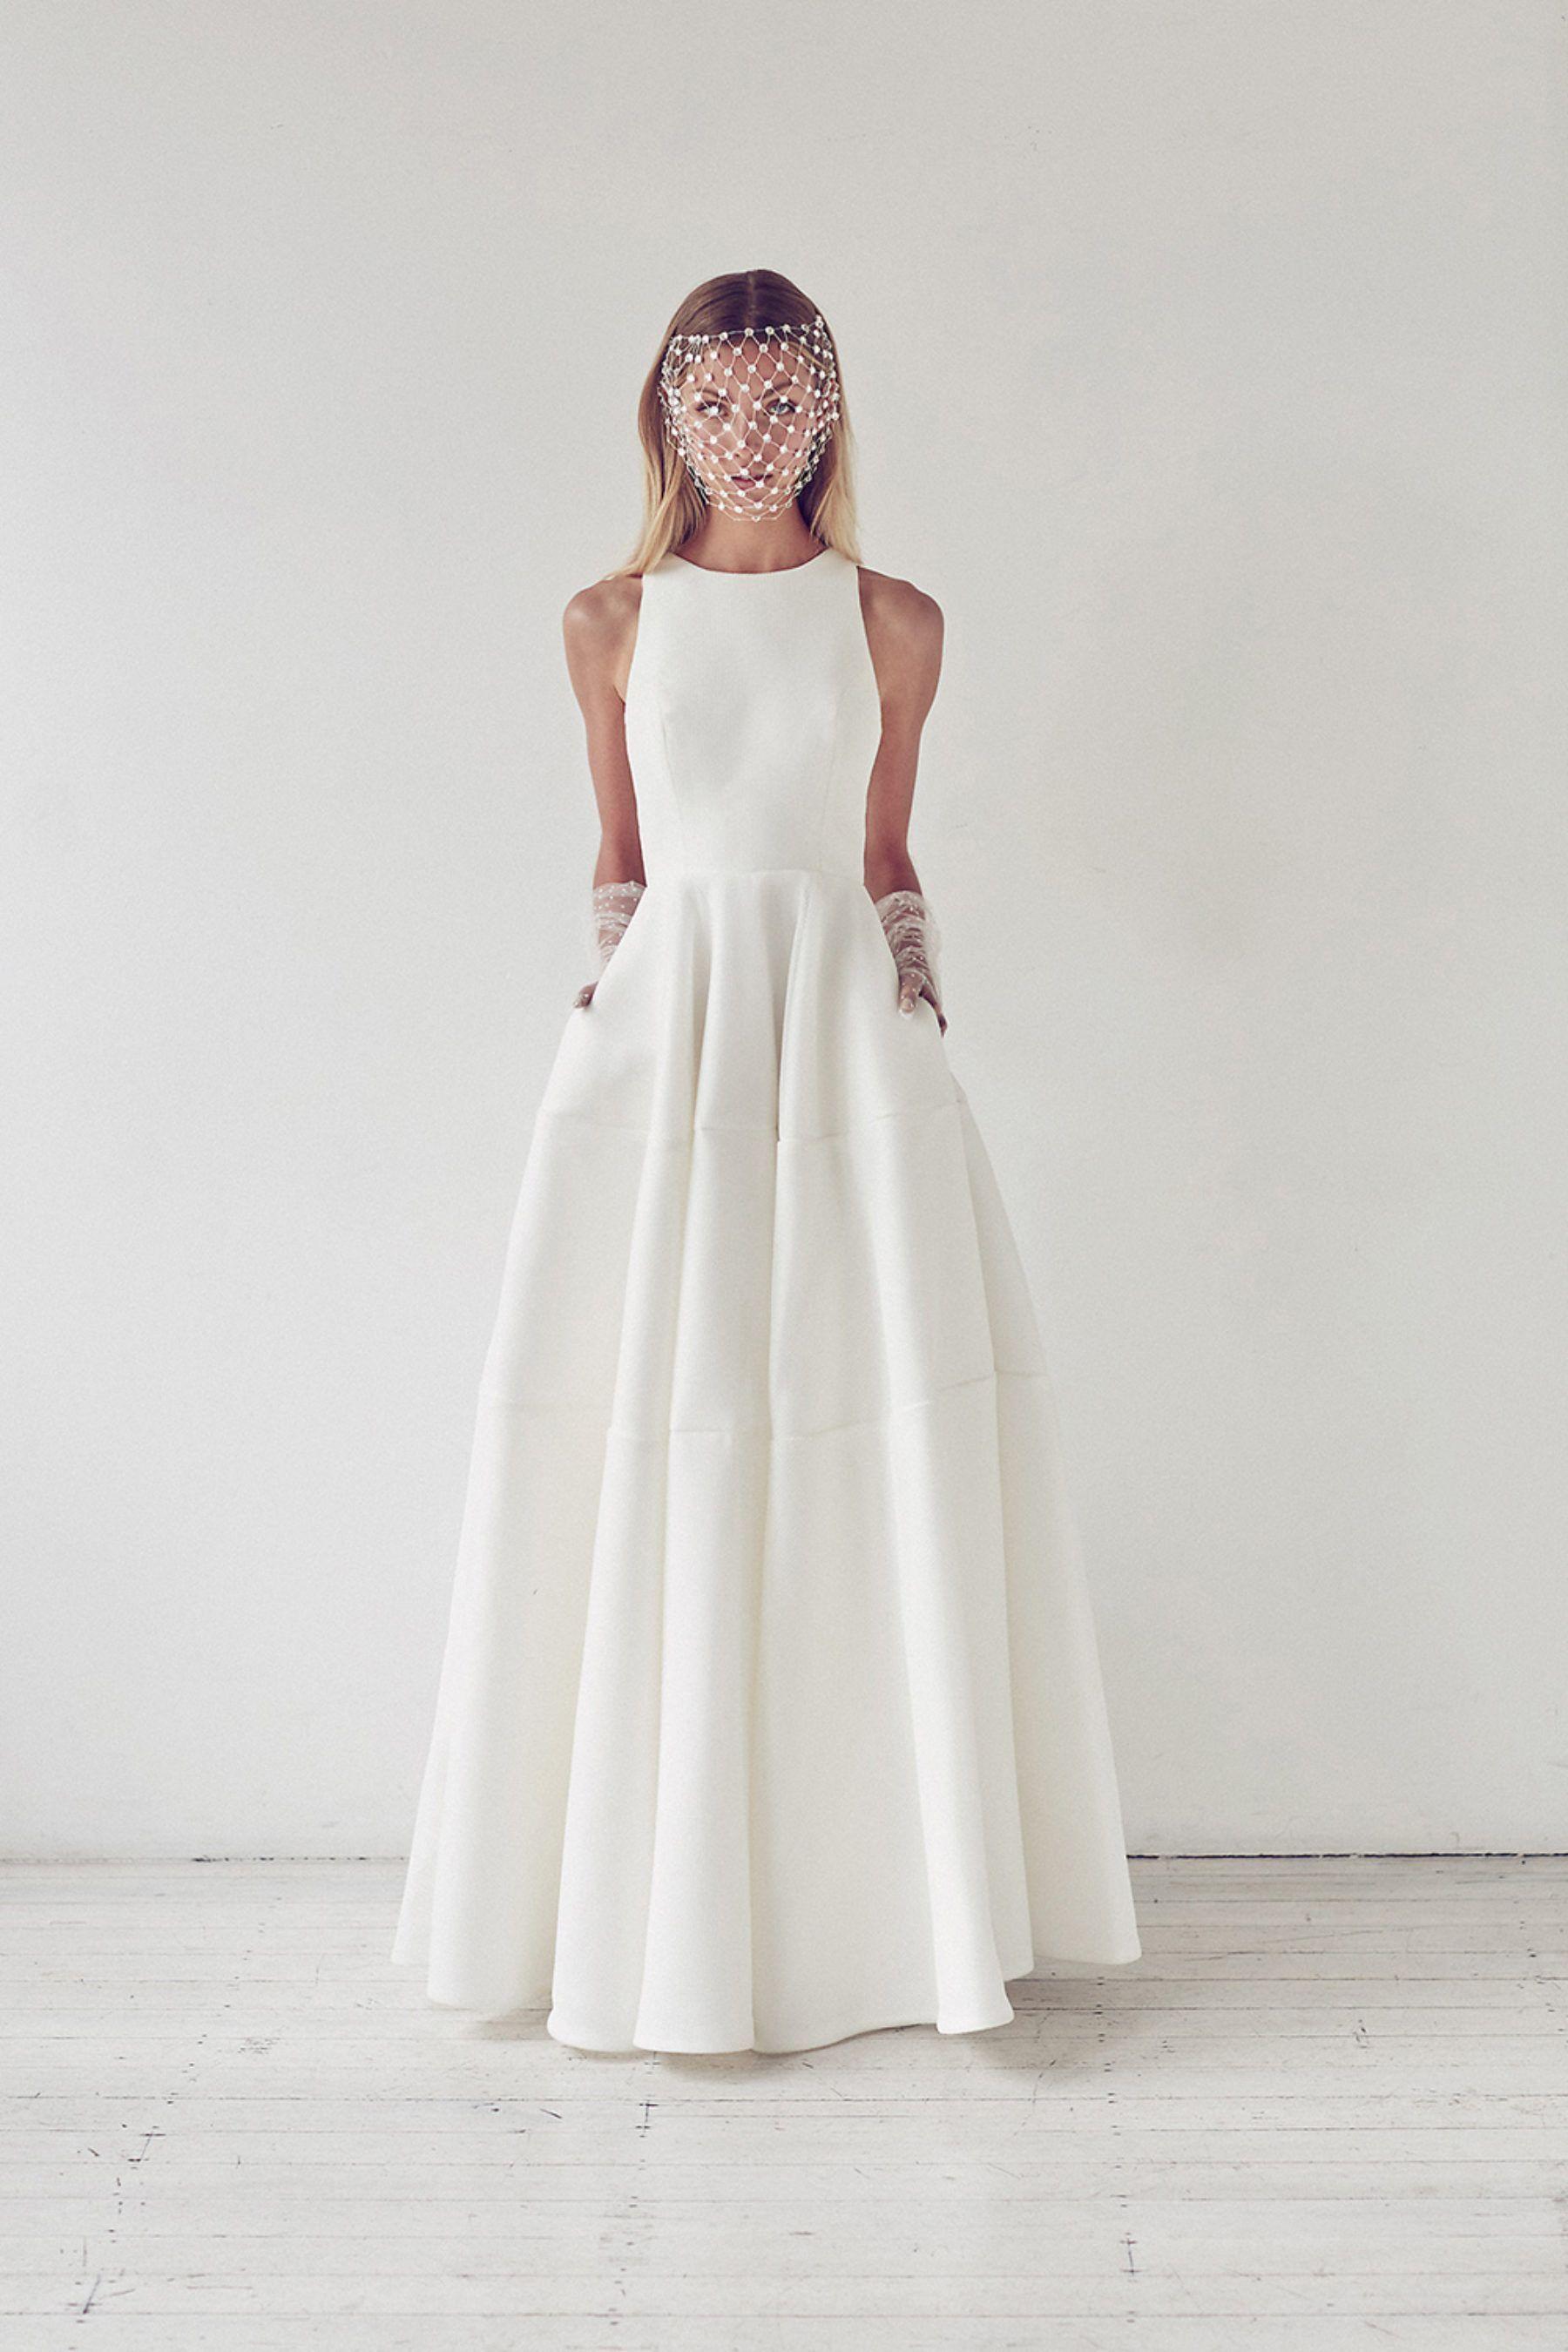 Simple Elegant Satin Floor Length Wedding Dress, Round